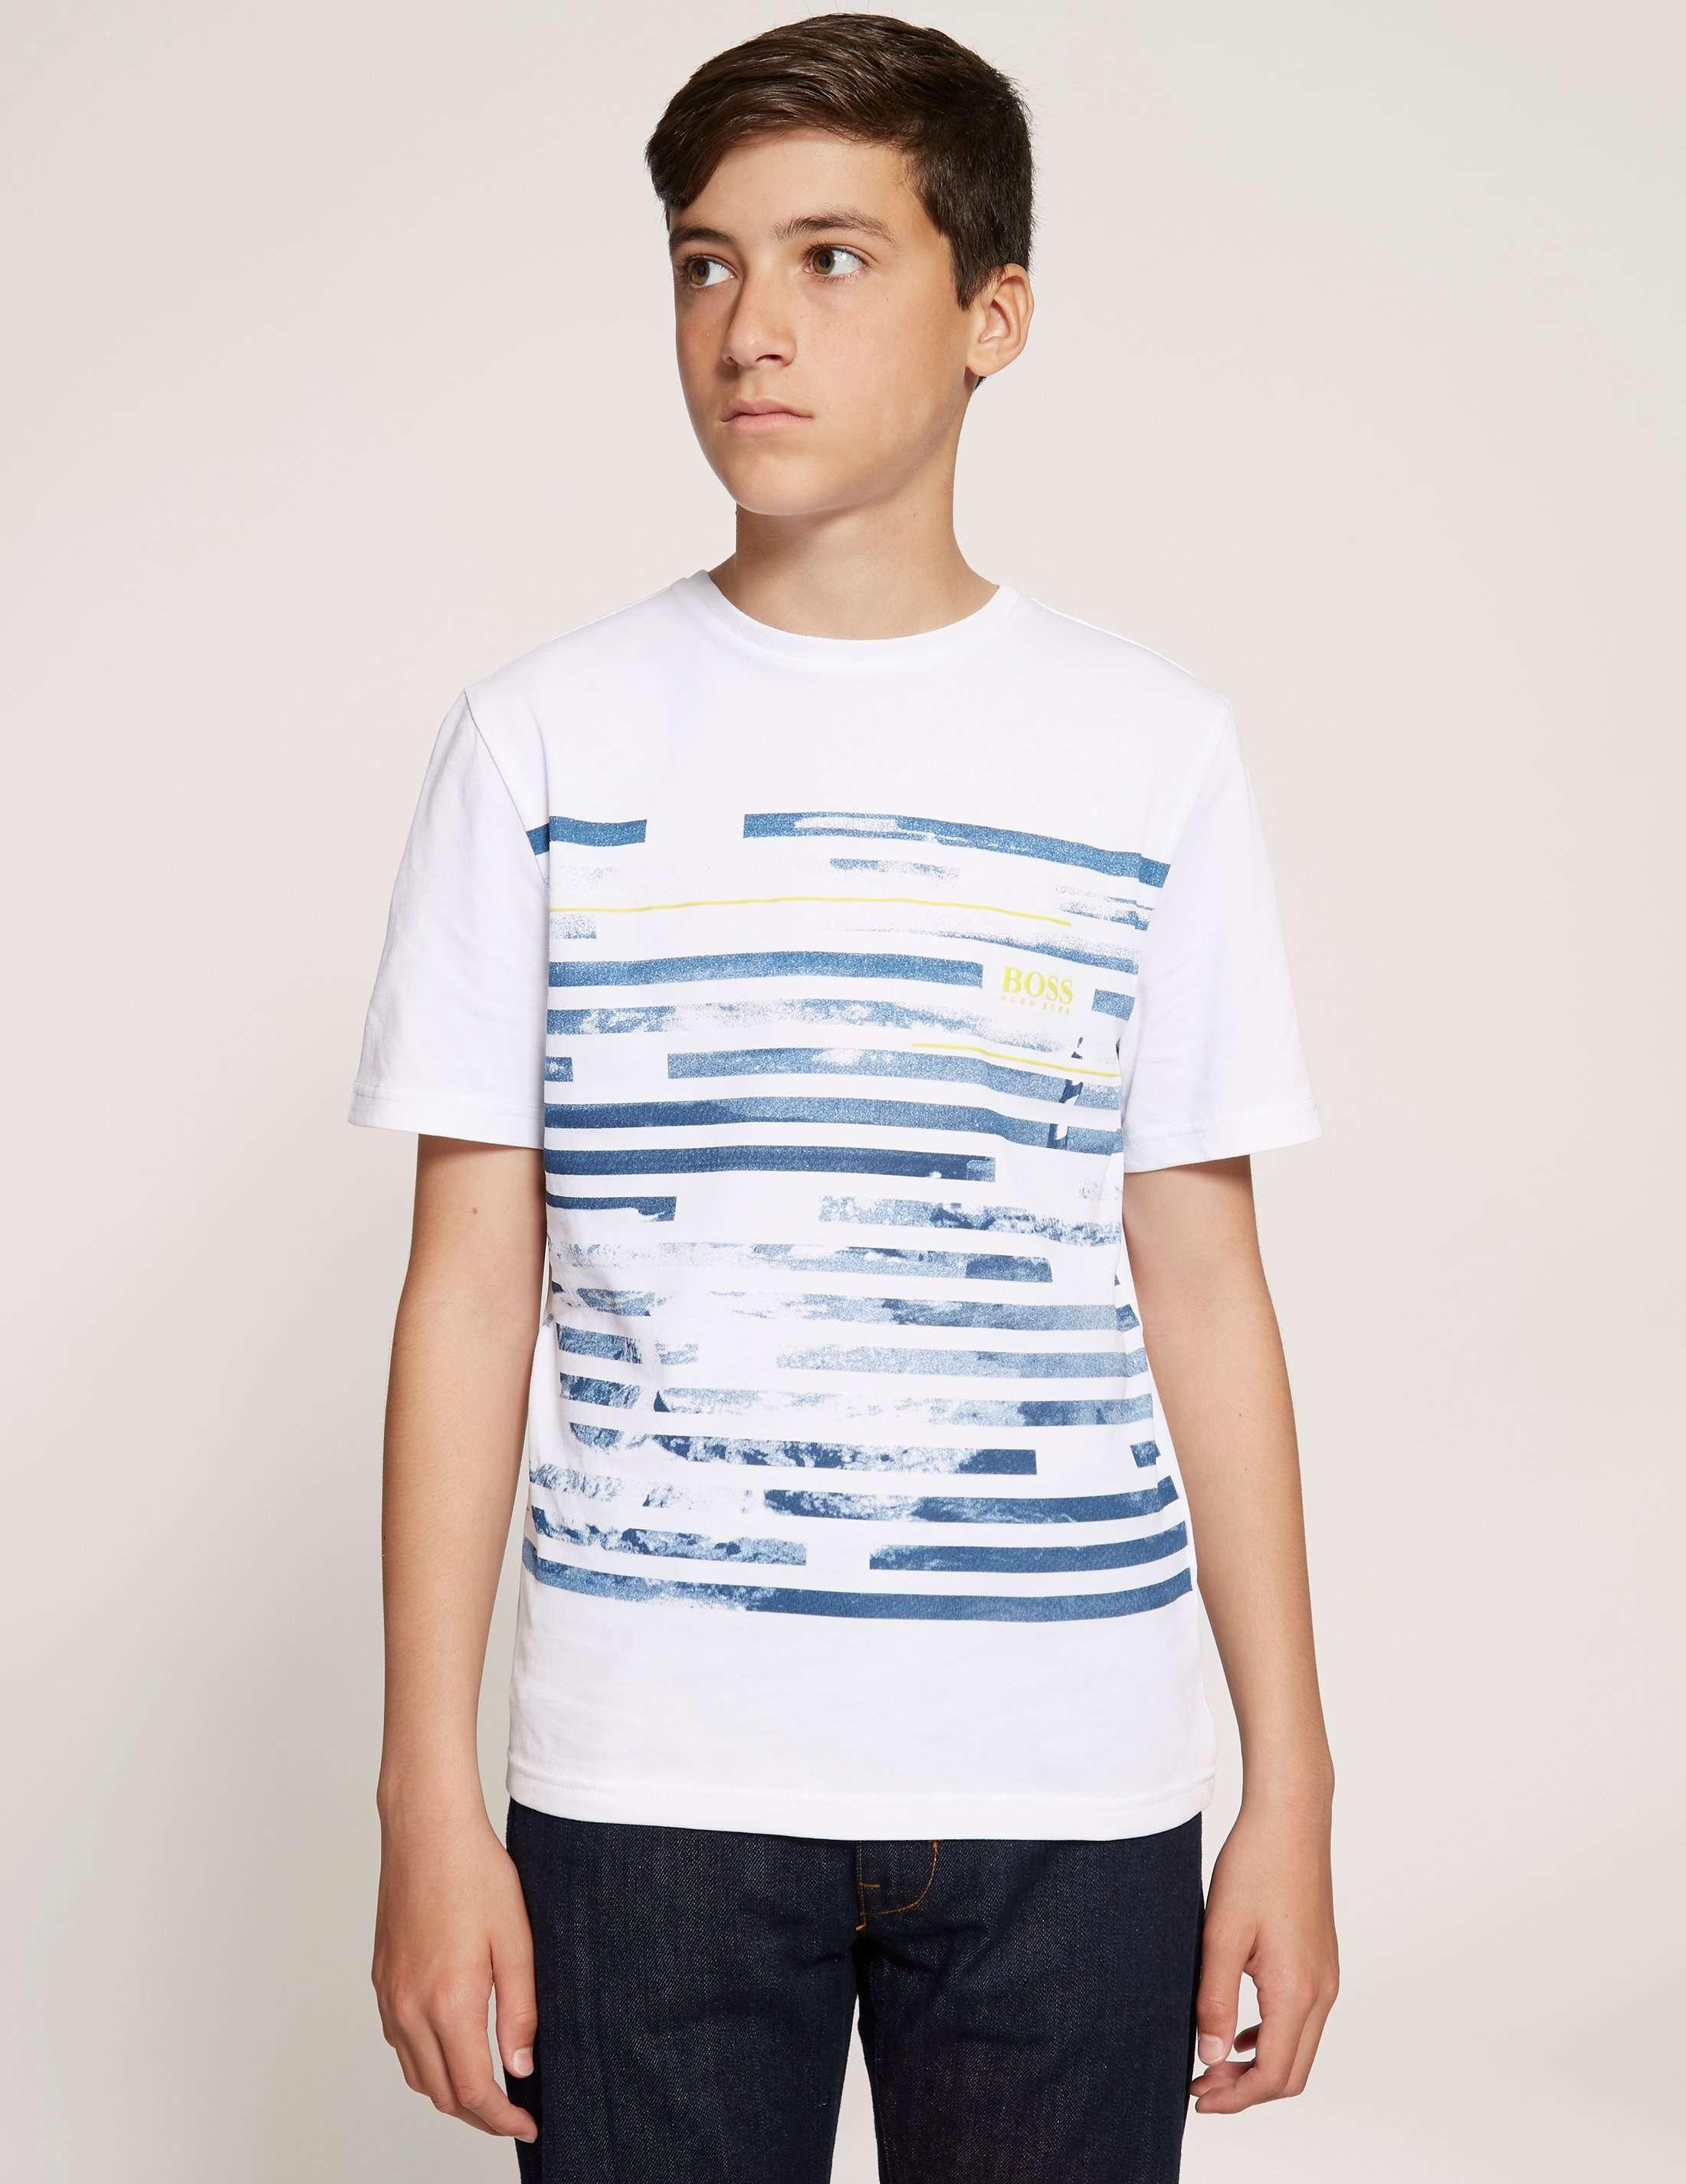 BOSS Stripe Print Short Sleeve T-Shirt